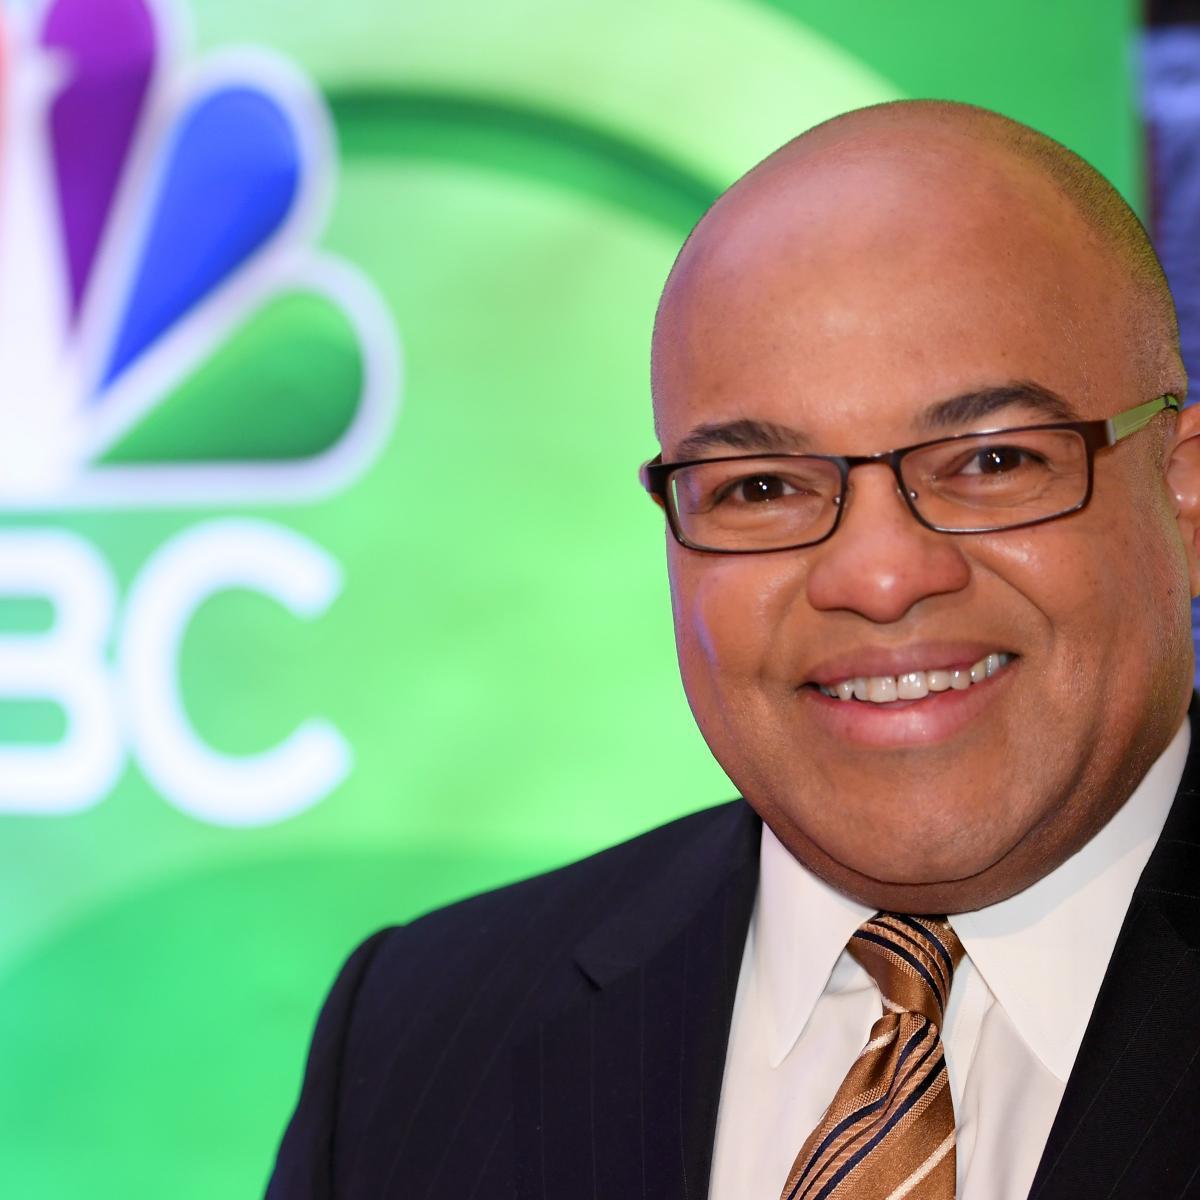 Mike Tirico: Mike Tirico Replaces Al Michaels On NBC's Thursday Night